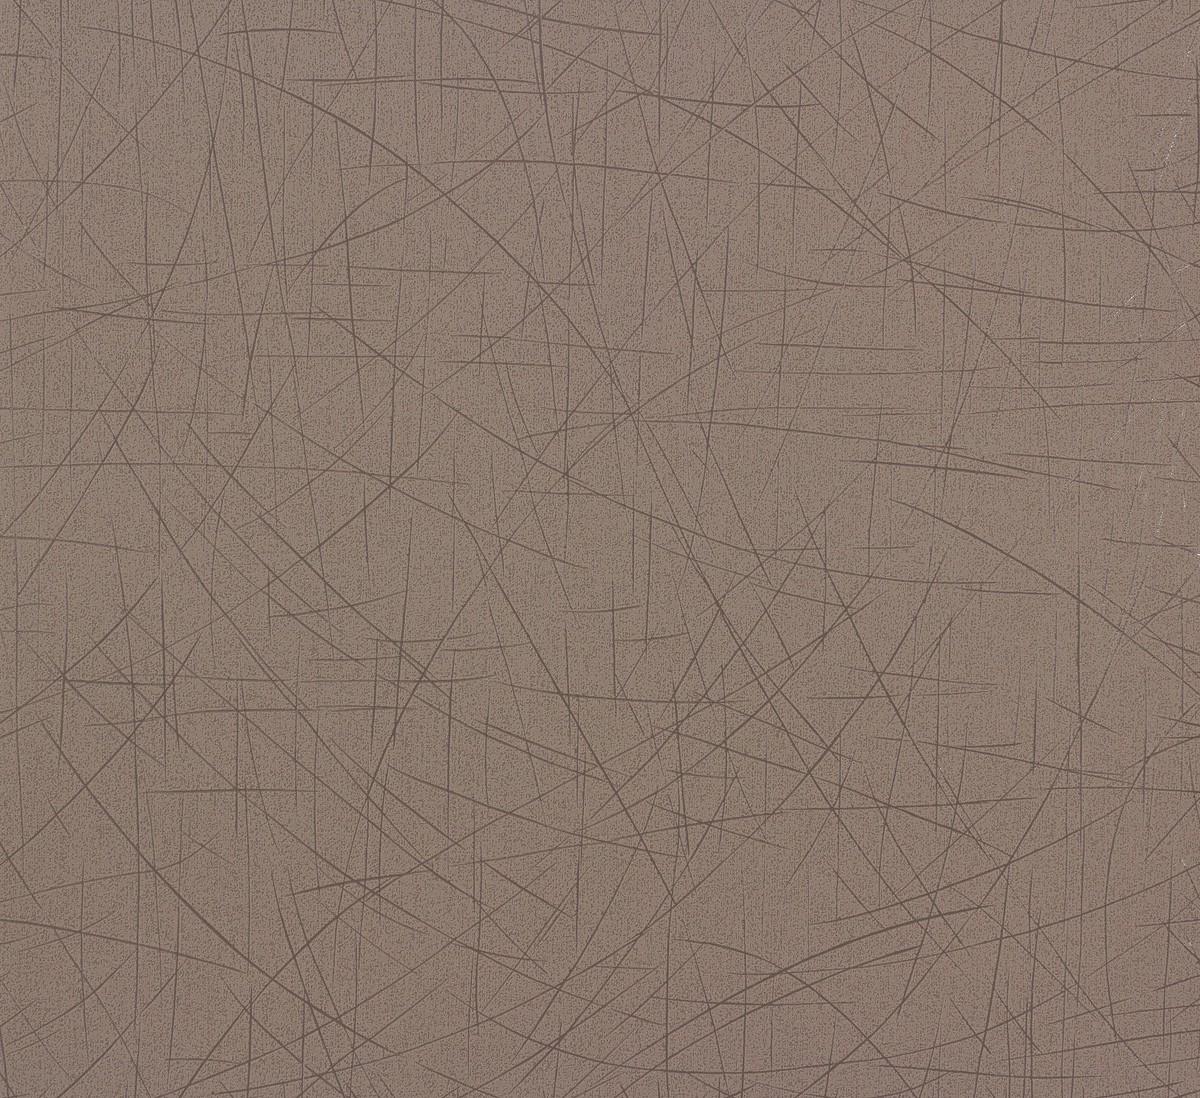 wallpaper abstract pattern brown marburg wohnsinn 55626. Black Bedroom Furniture Sets. Home Design Ideas